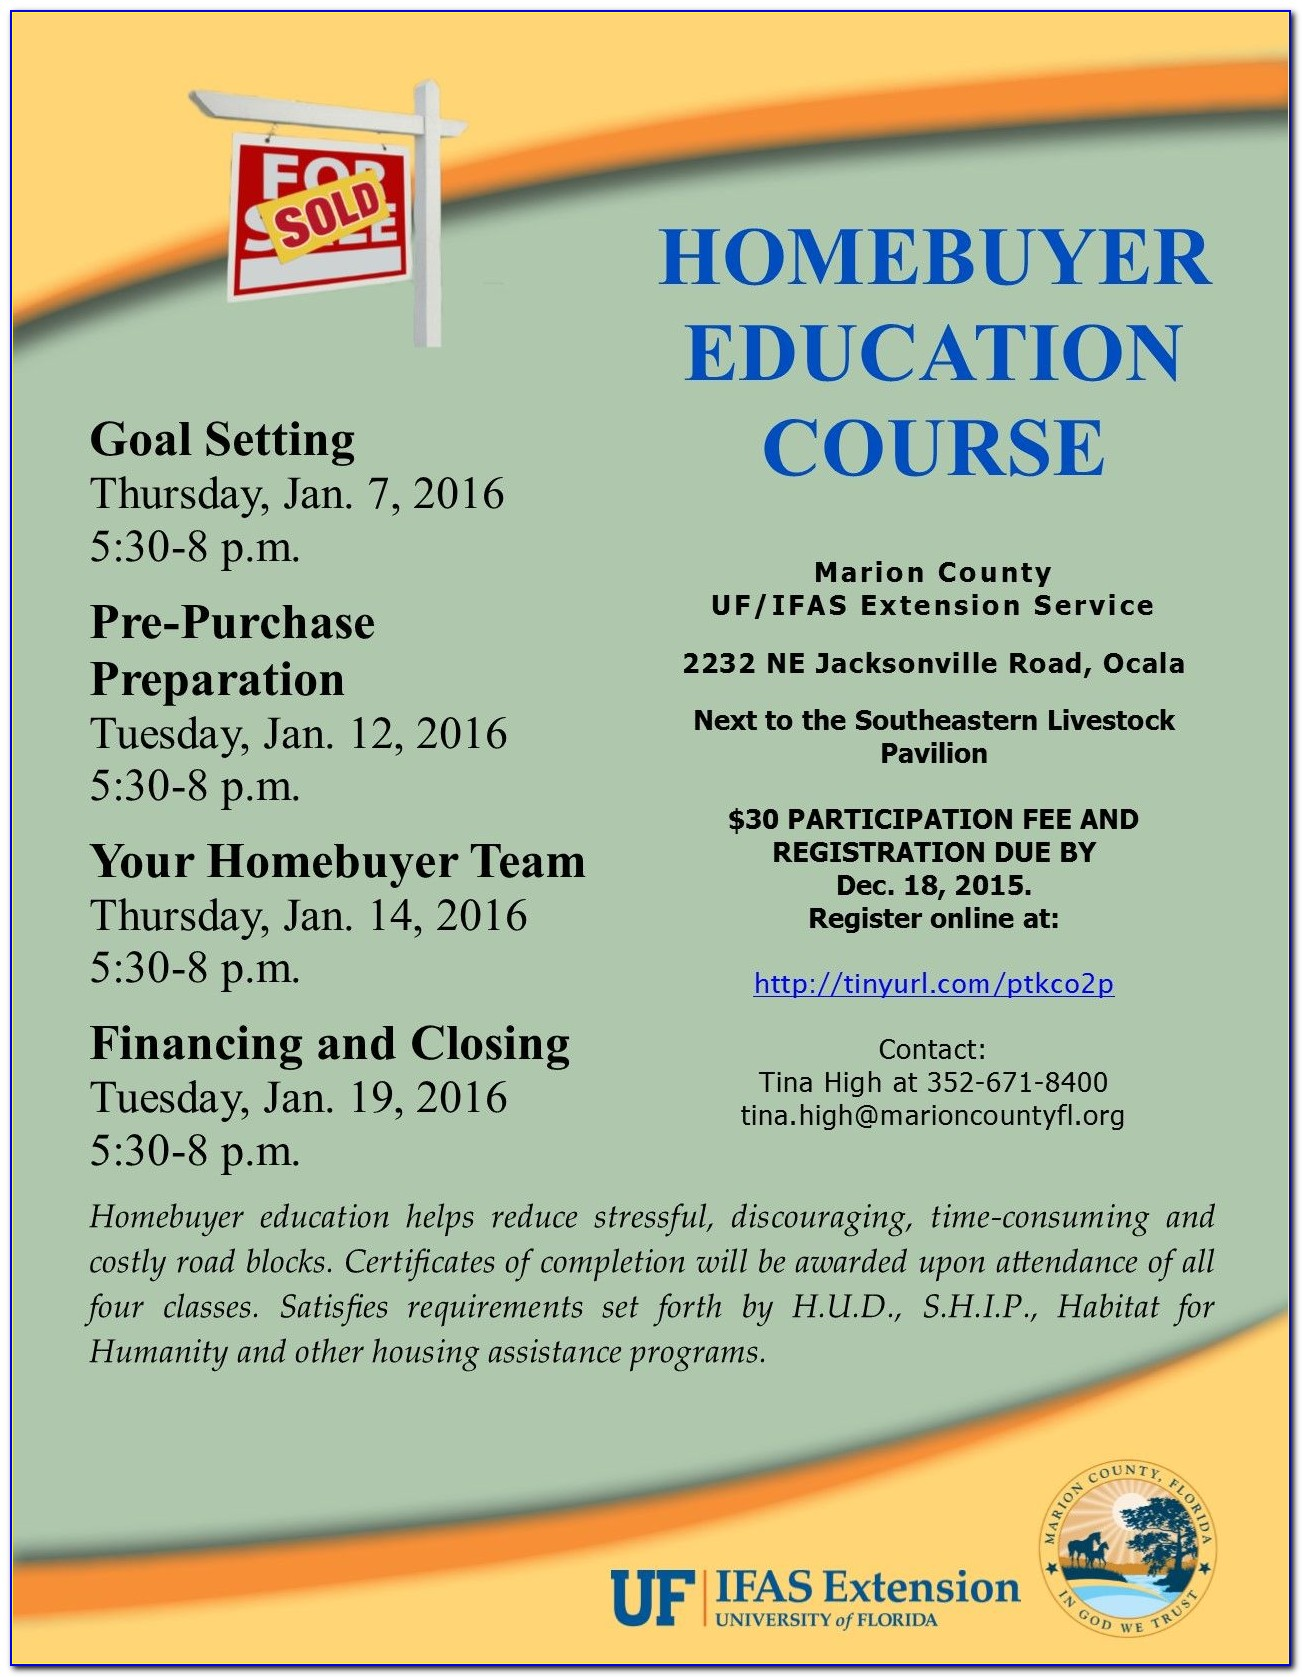 Homebuyer Education Certificate Fannie Mae